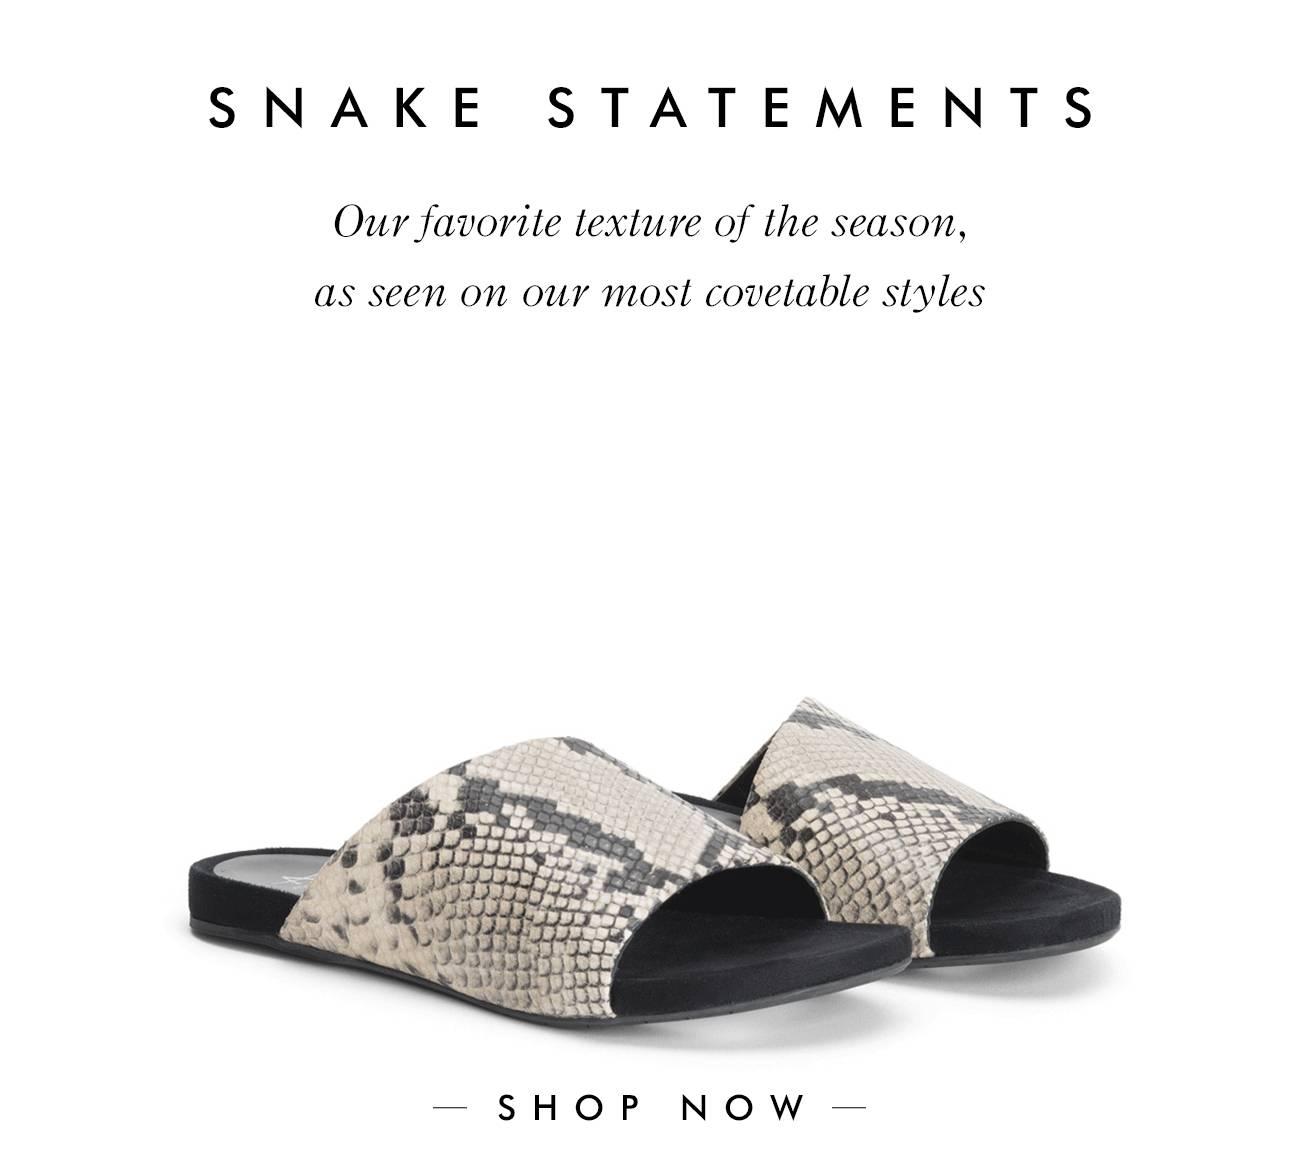 Snake Statements